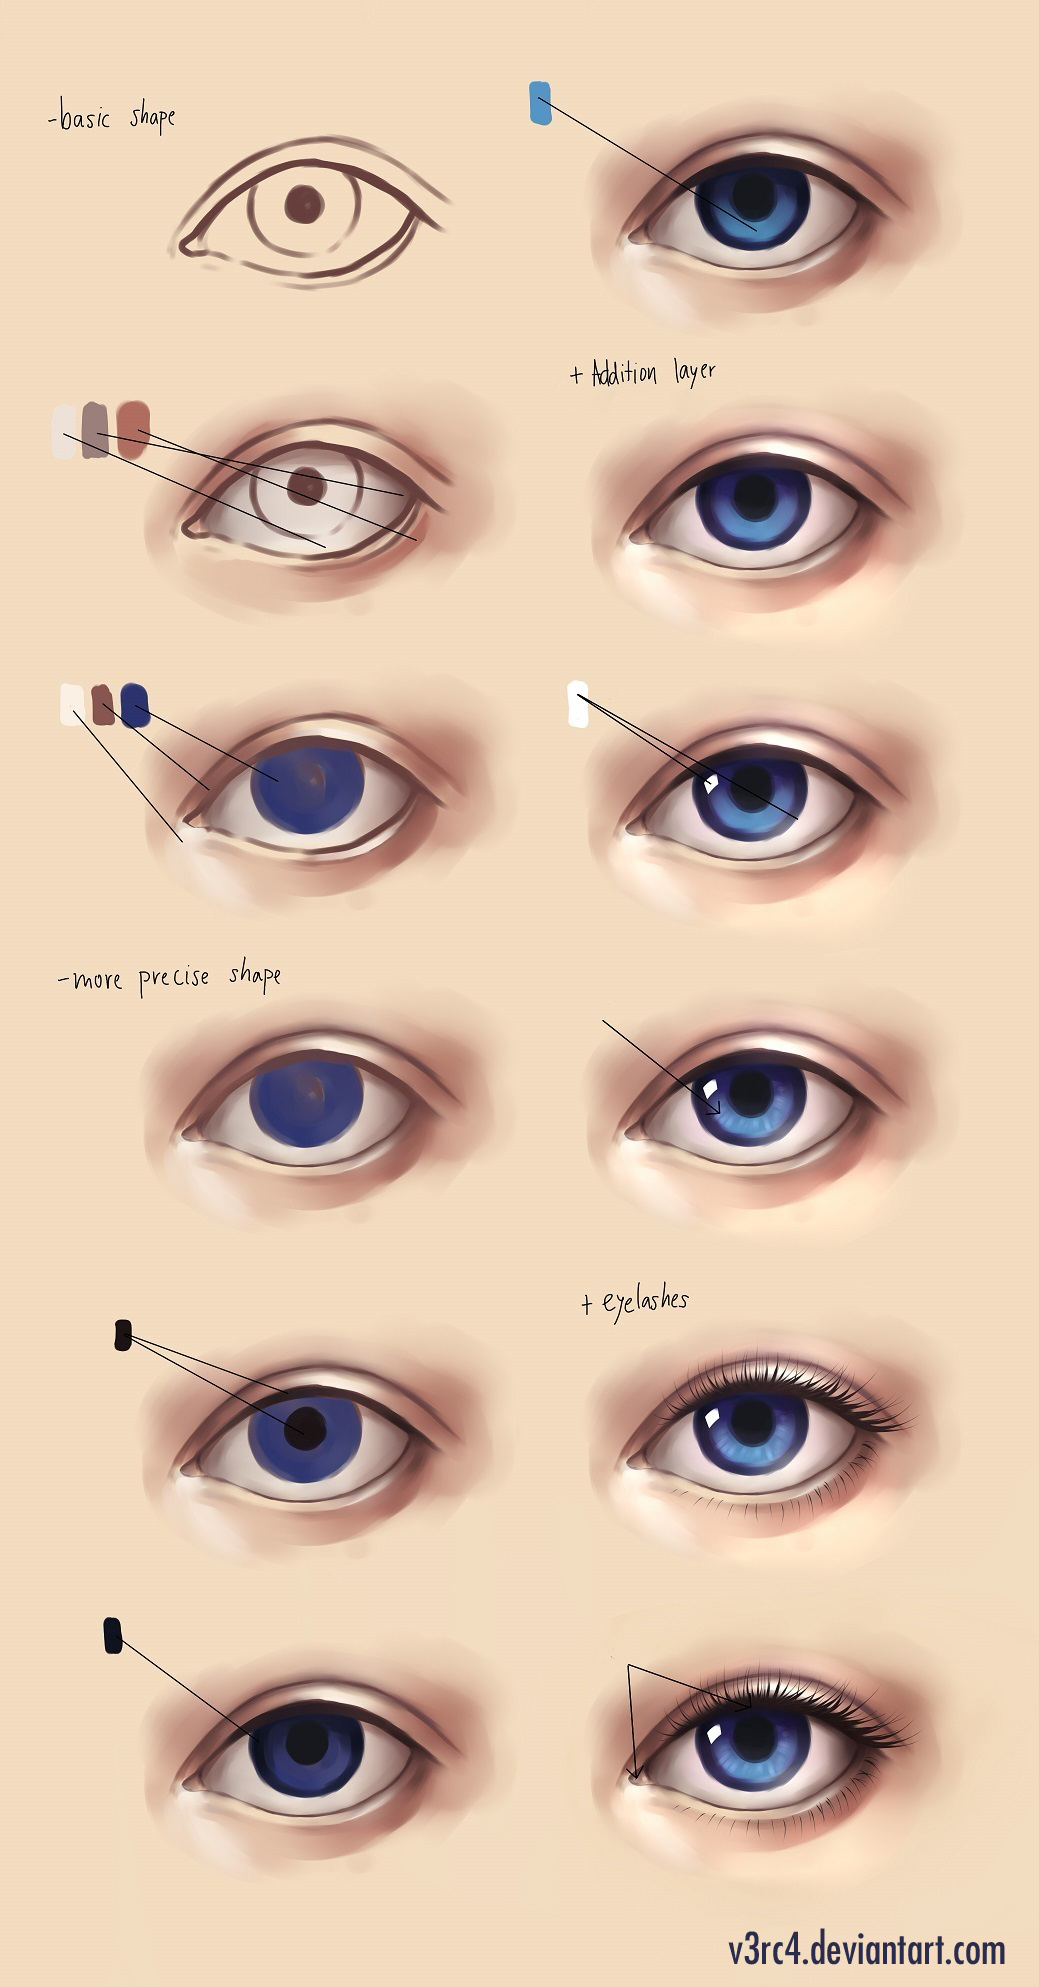 Semi realistic eye - step by step by V3rc4